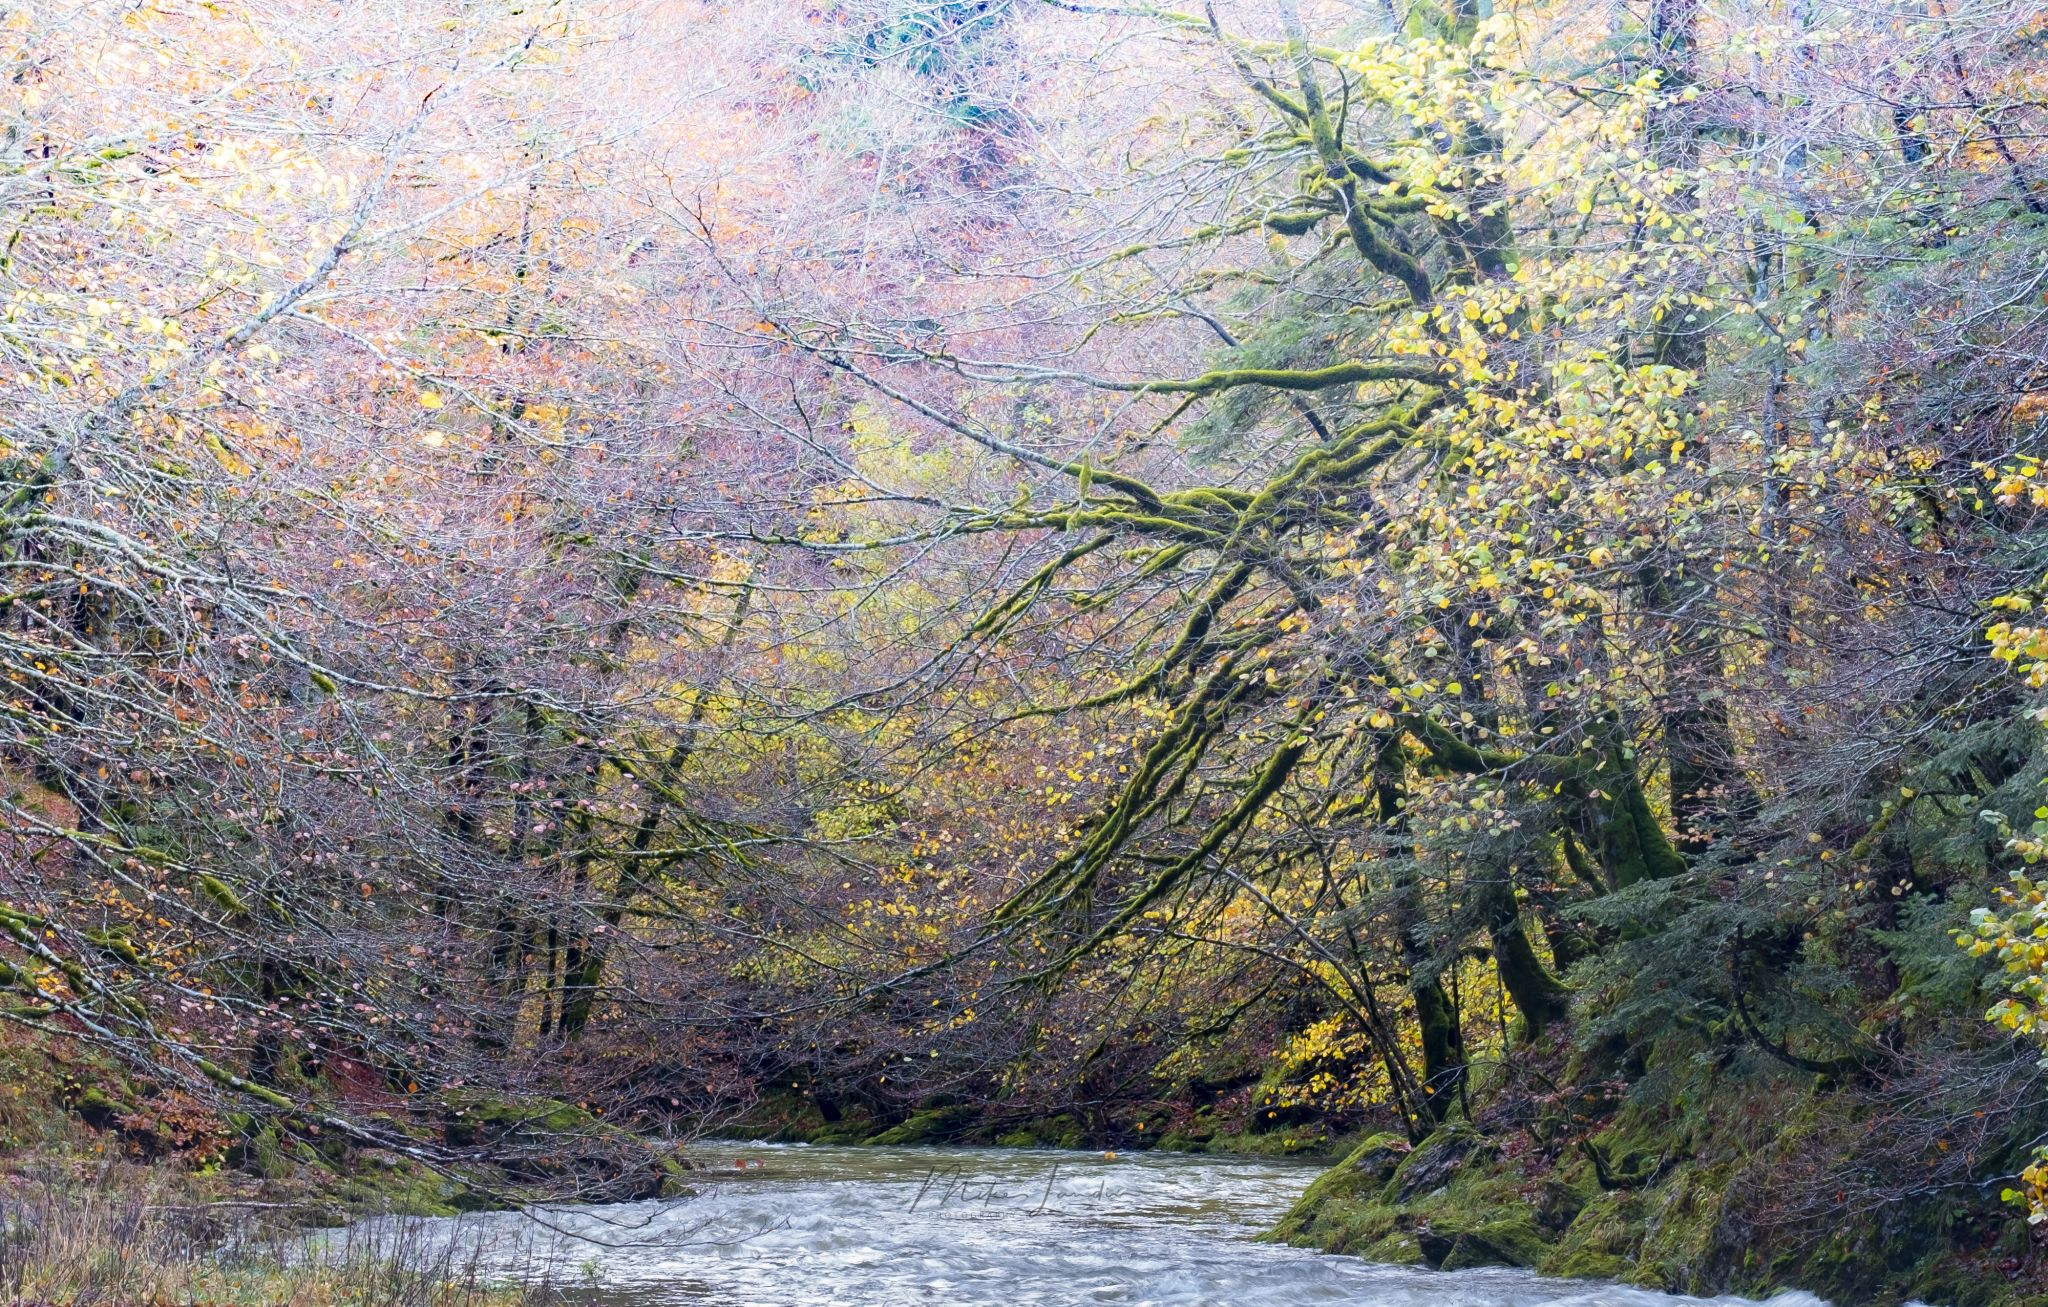 Selva de Irati - Irati forest, Spain